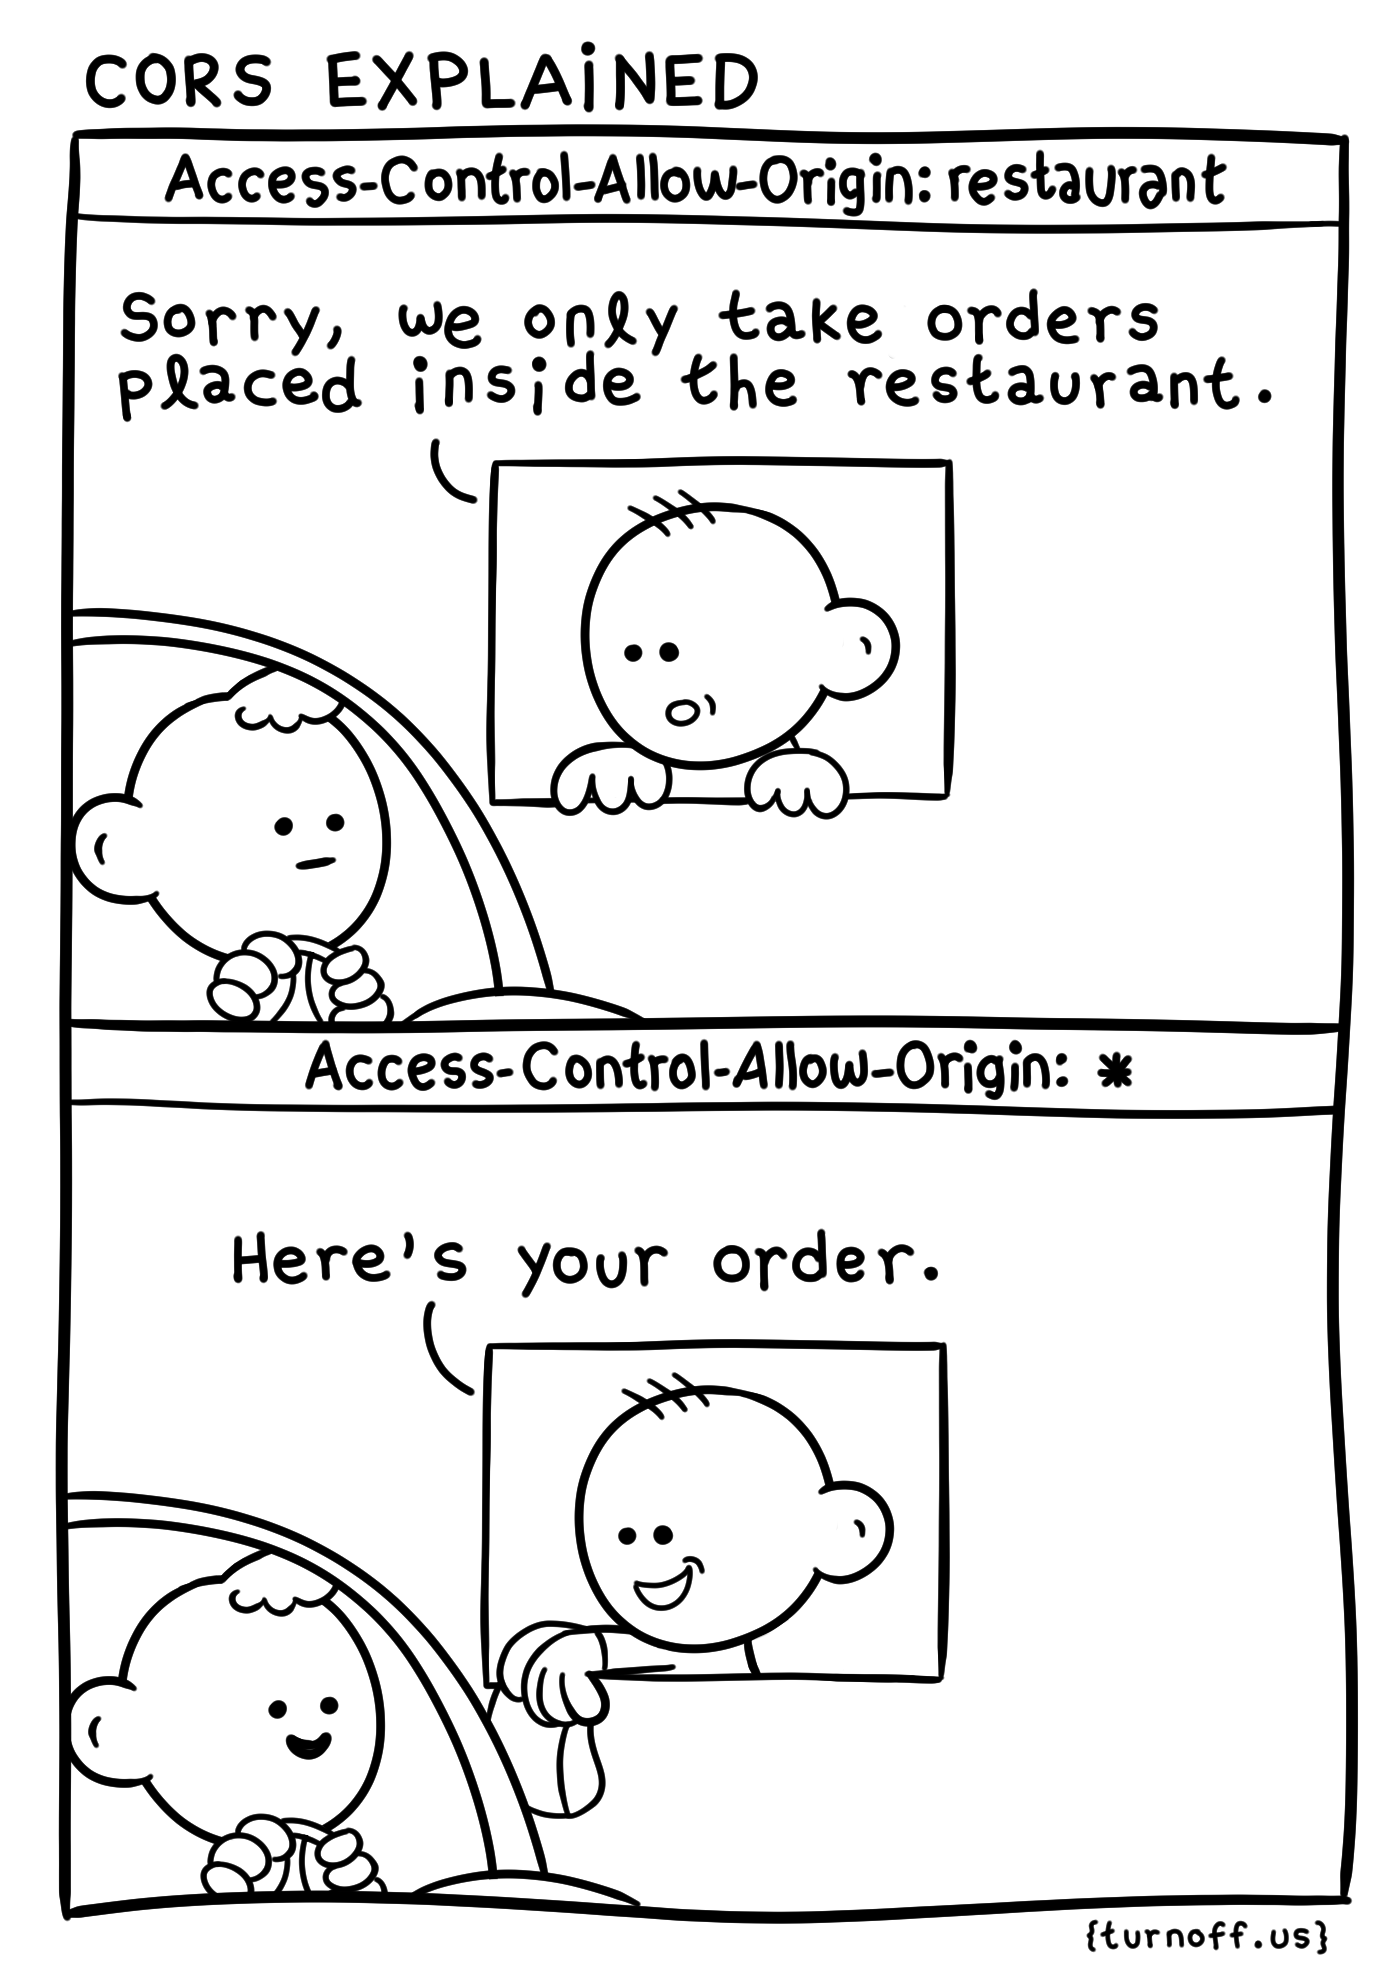 via the inimitable  Daniel Stori  , crafting superb comics at  turnoff.us  !